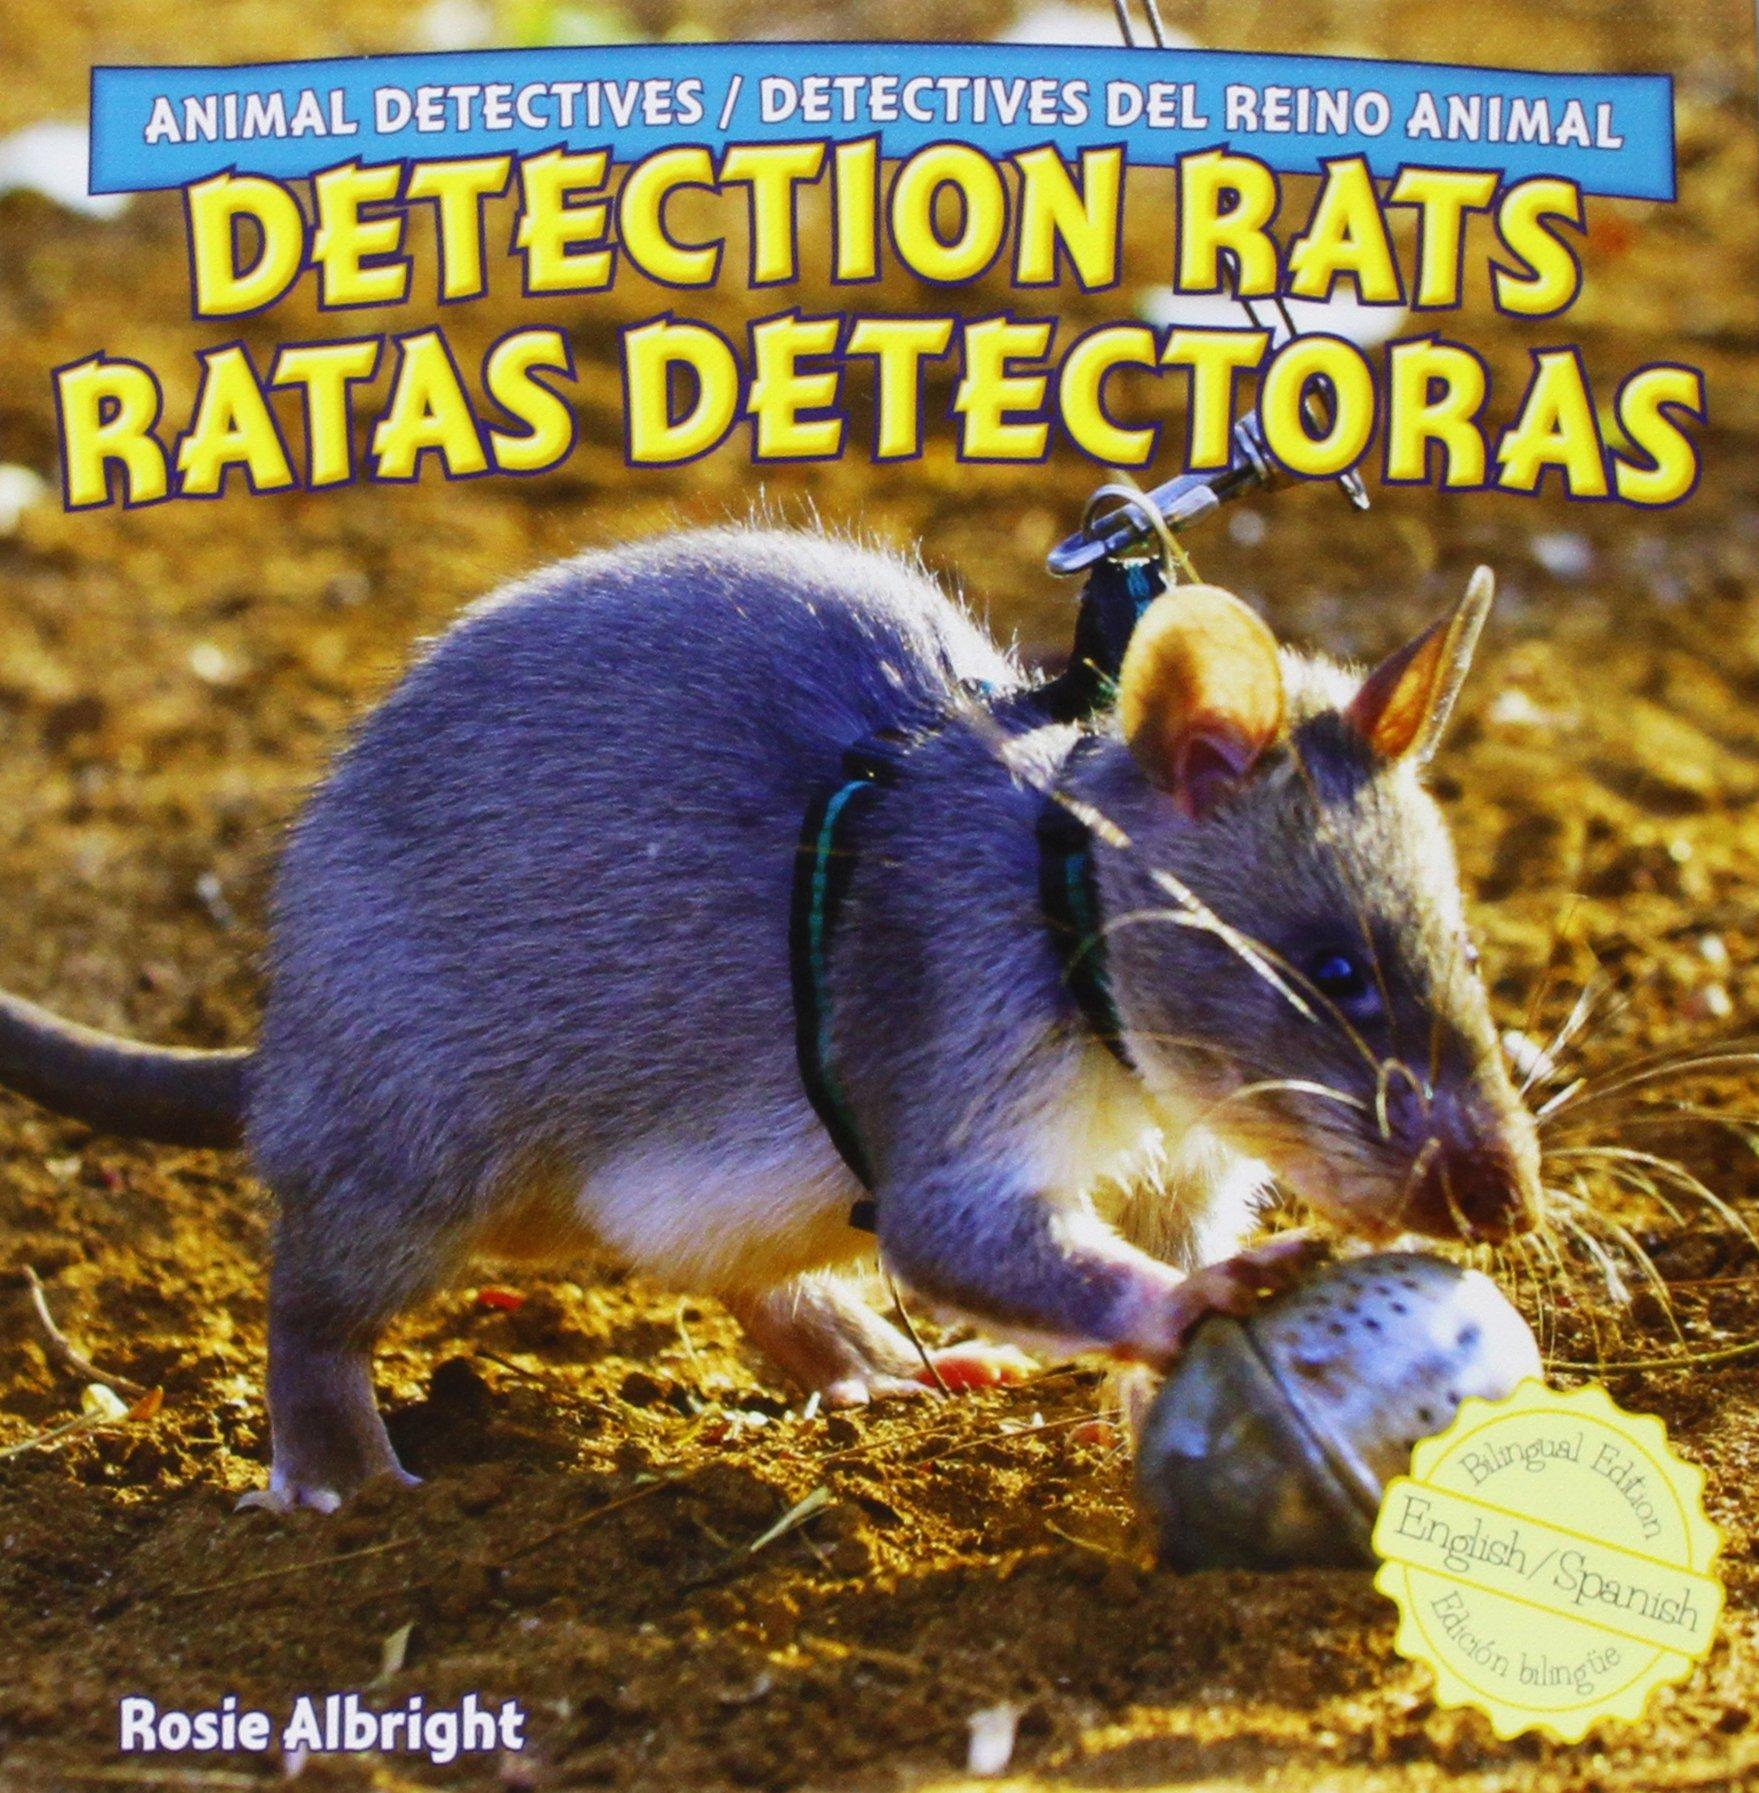 Detection Rats / Ratas Detectoras Animal Detectives / Detectives Del Reino Animal: Amazon.es: Rosie Albright, Eduardo Alaman: Libros